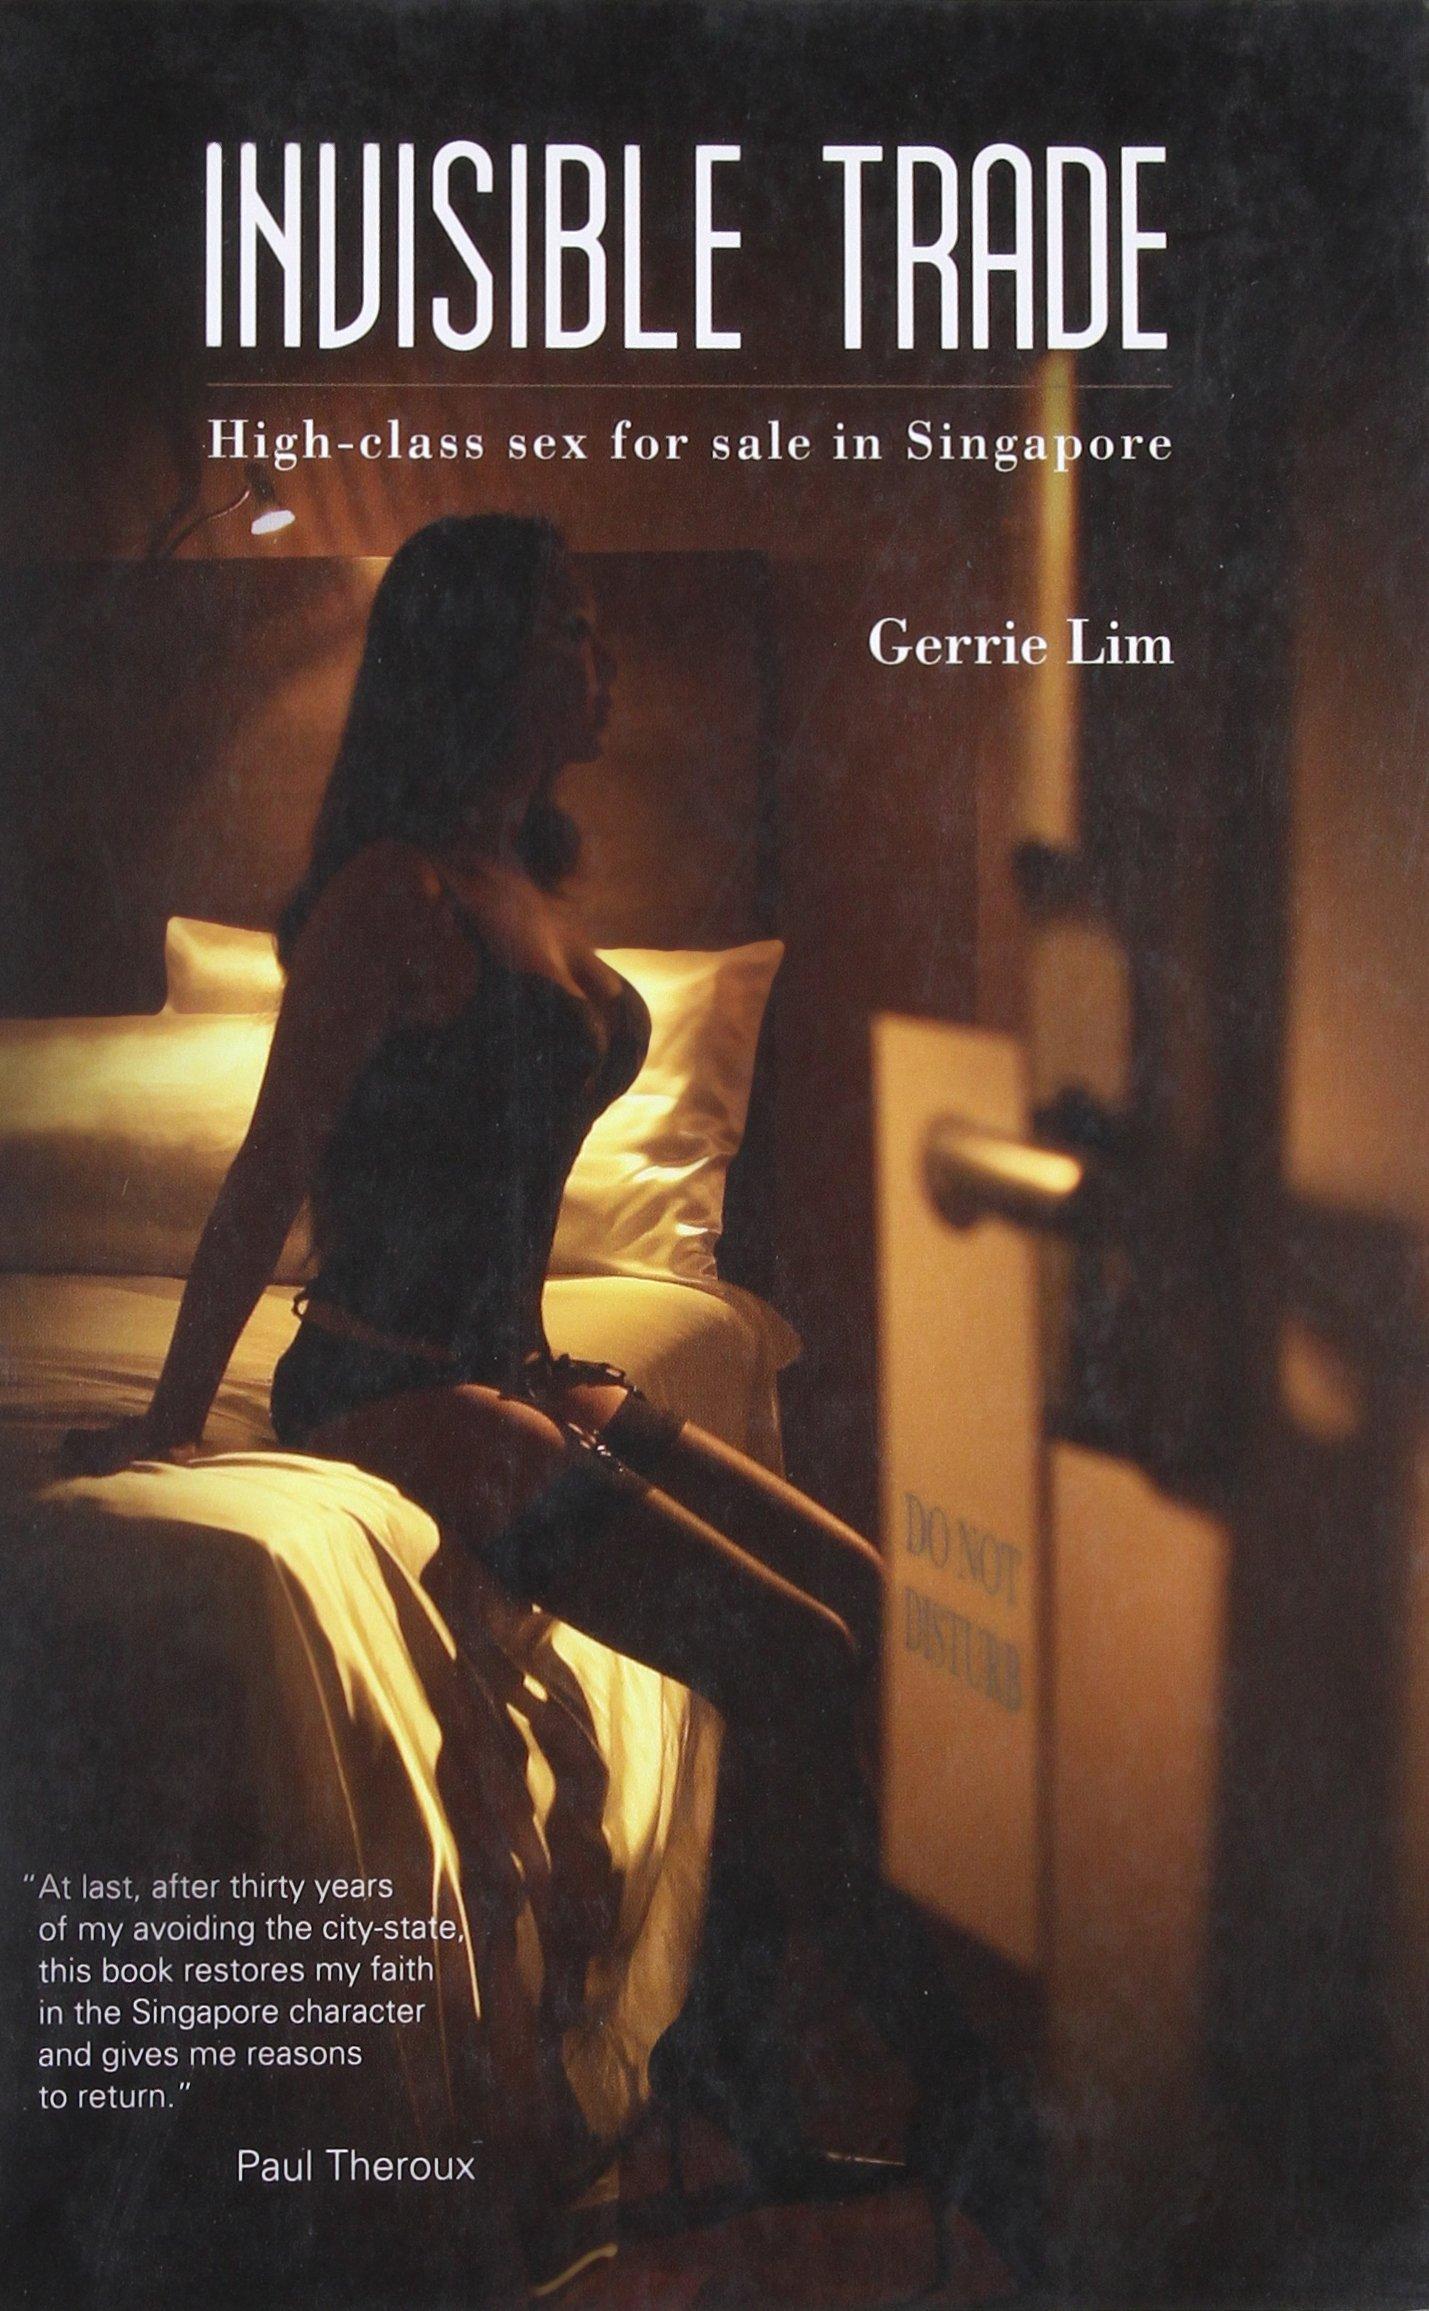 Amazon.com: Invisible Trade (9789810510336): Lim, Gerrie: Books